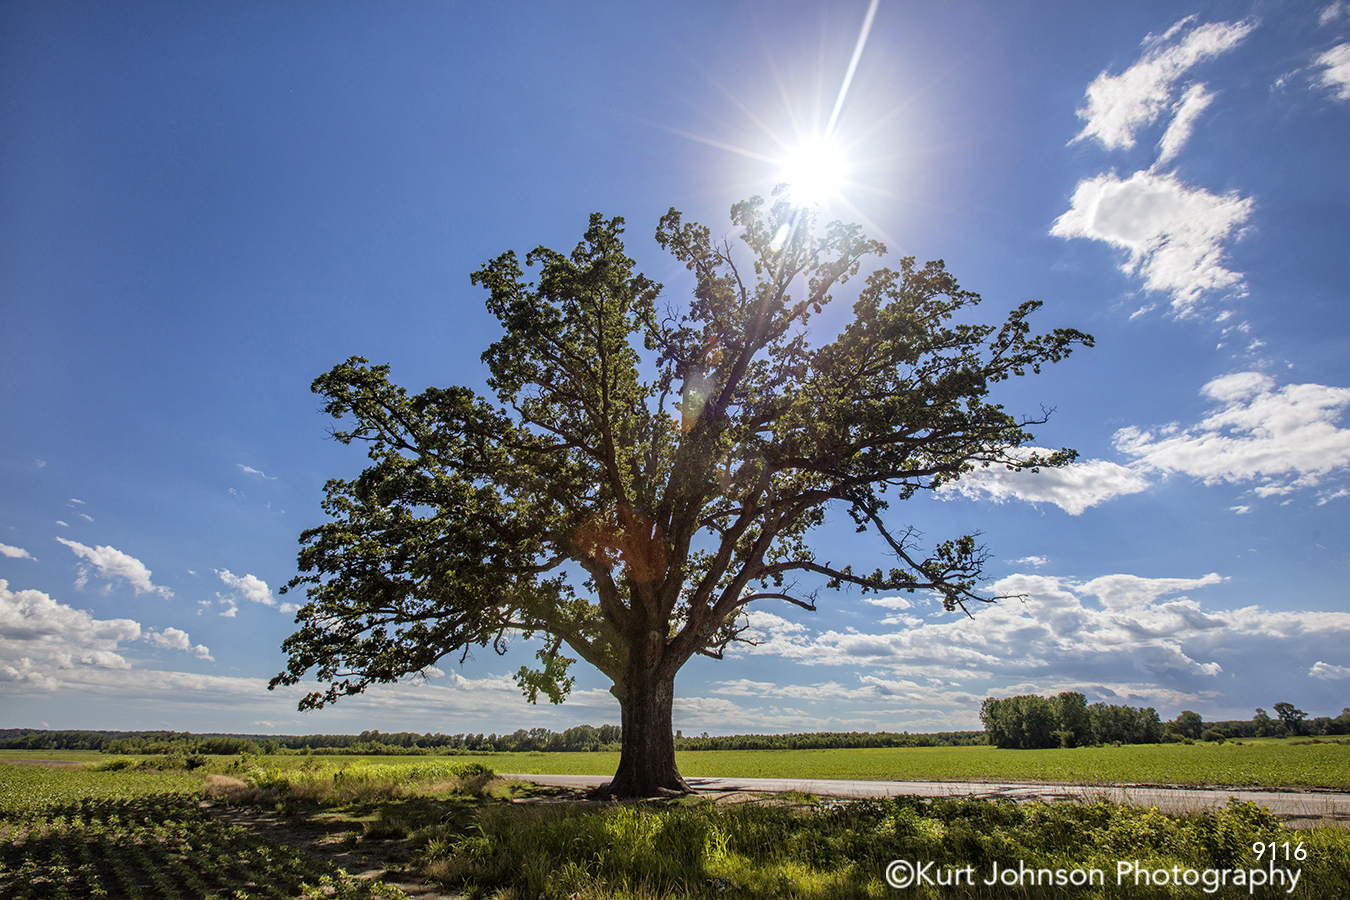 midwest tree blue sky green grass clouds sun flare field